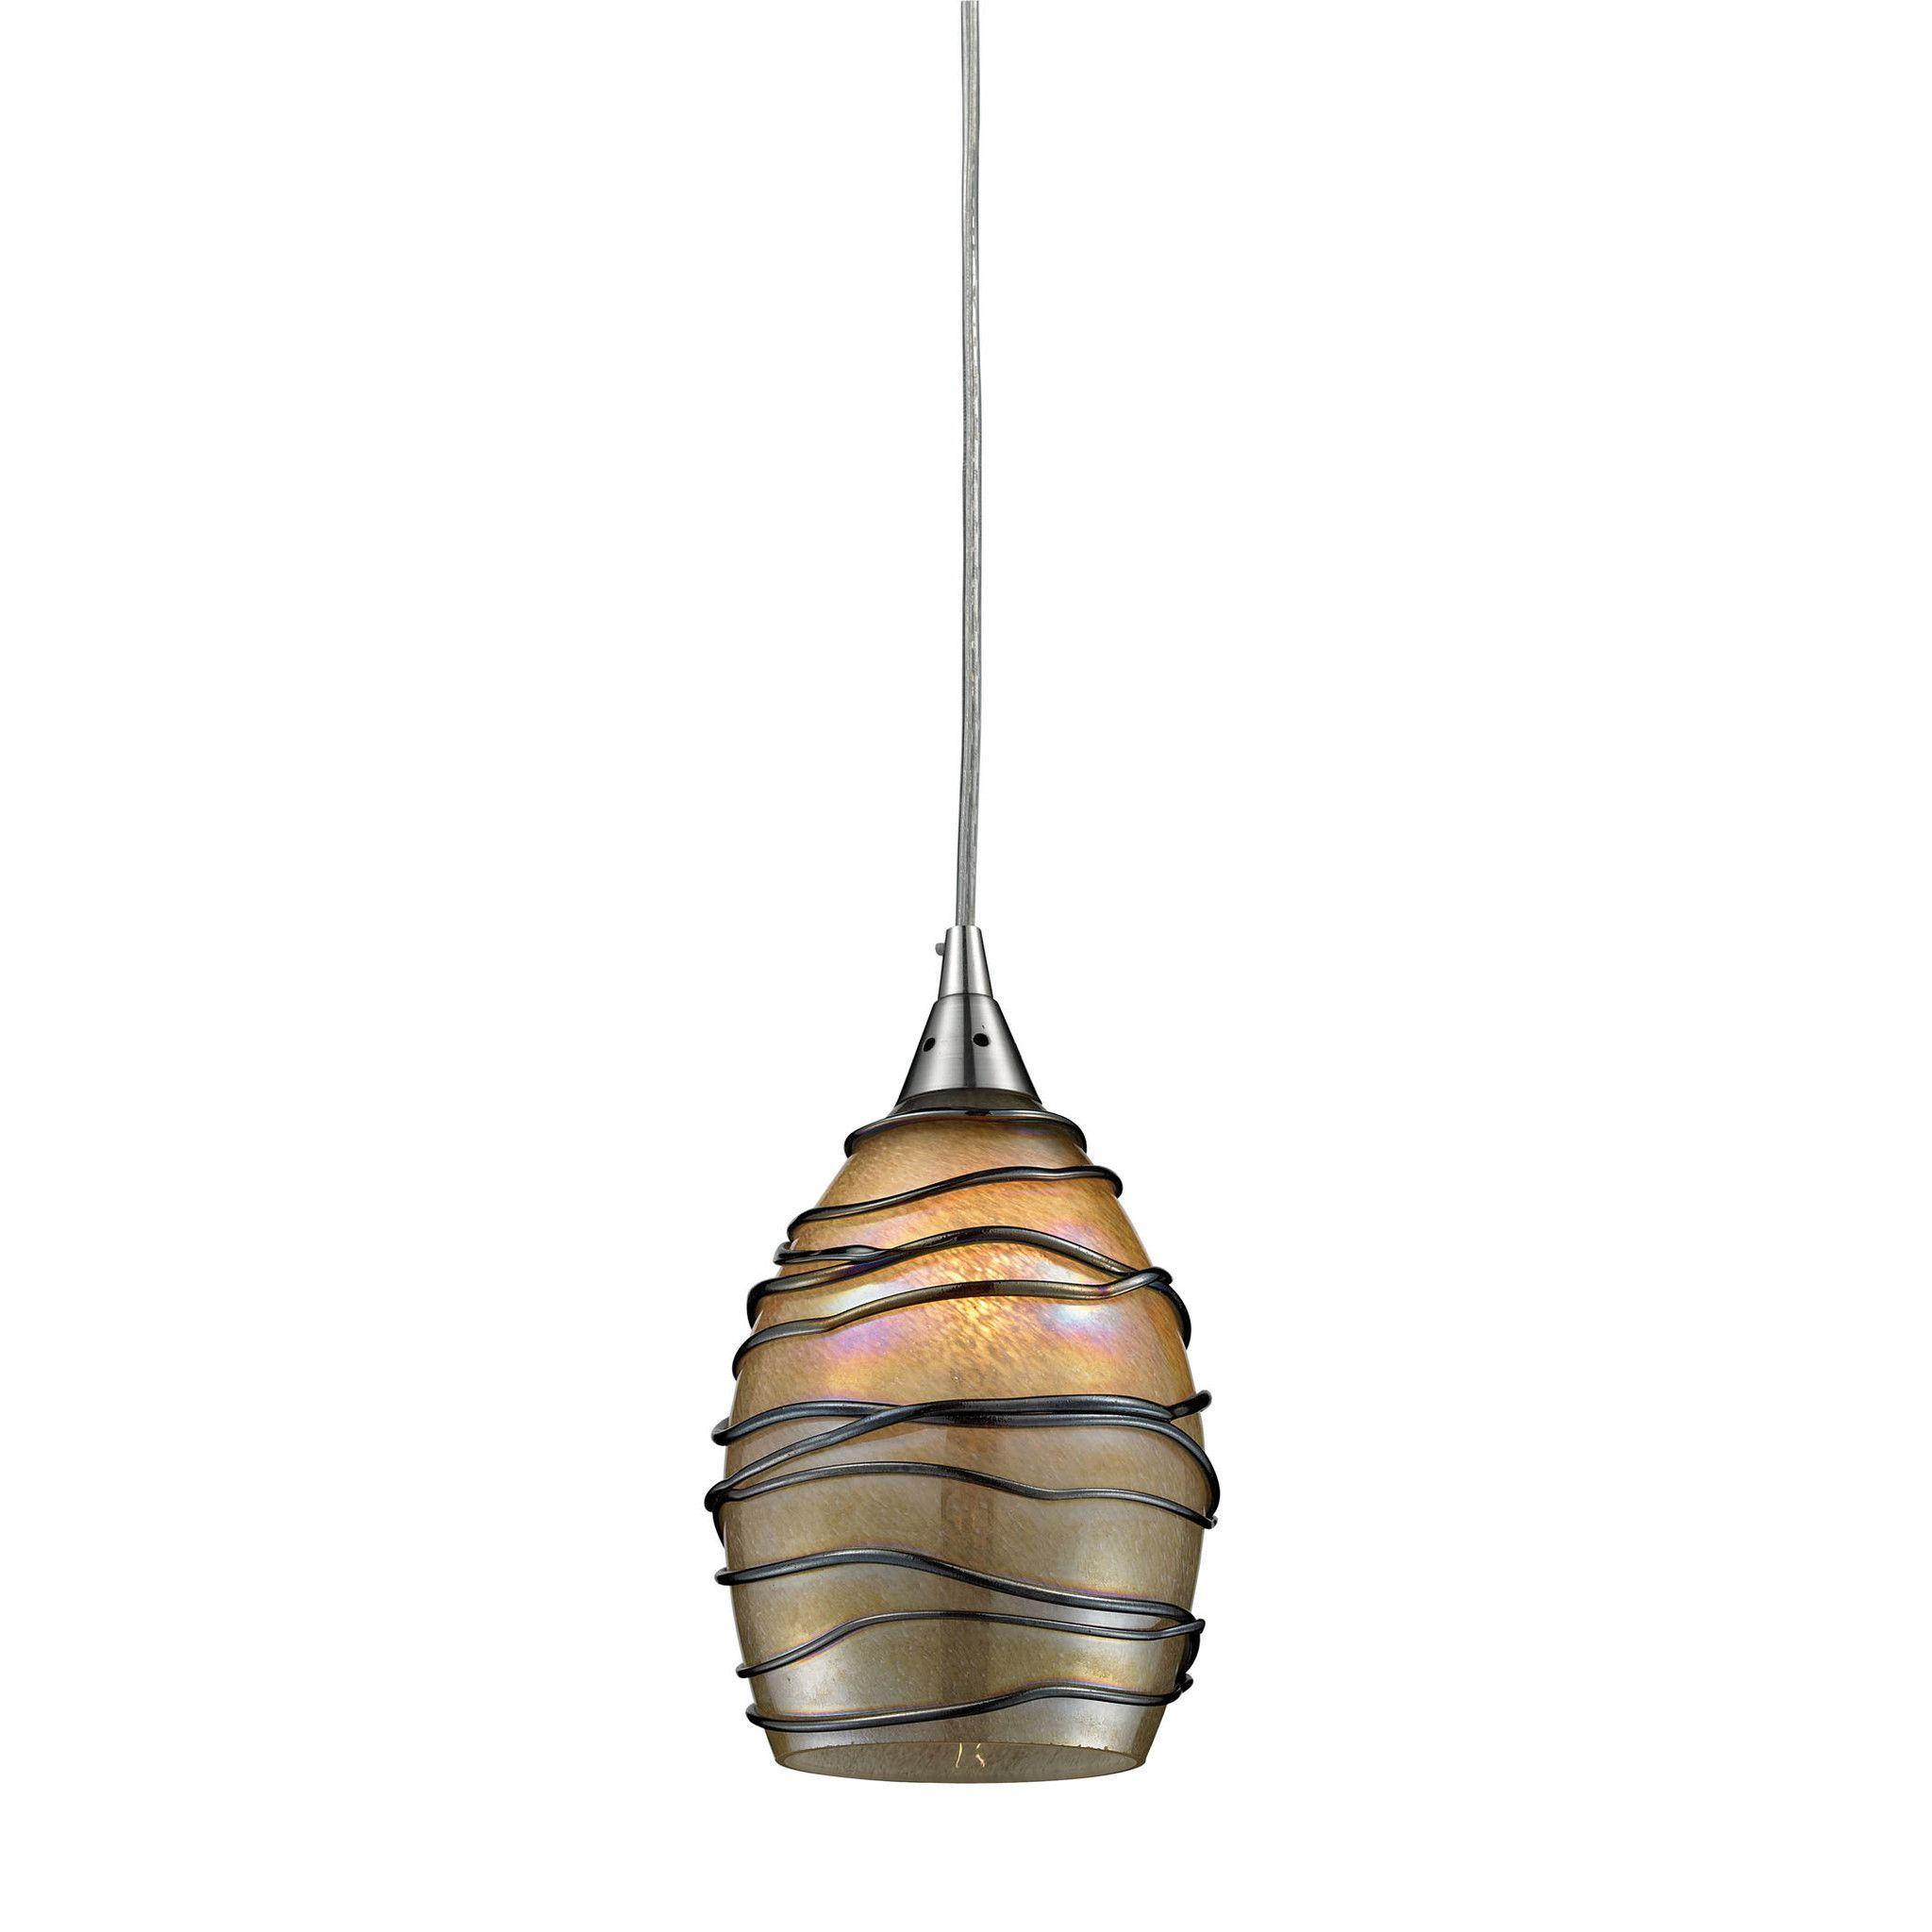 ELK Lighting 31142/1-LED Vines Collection Satin Nickel Finish